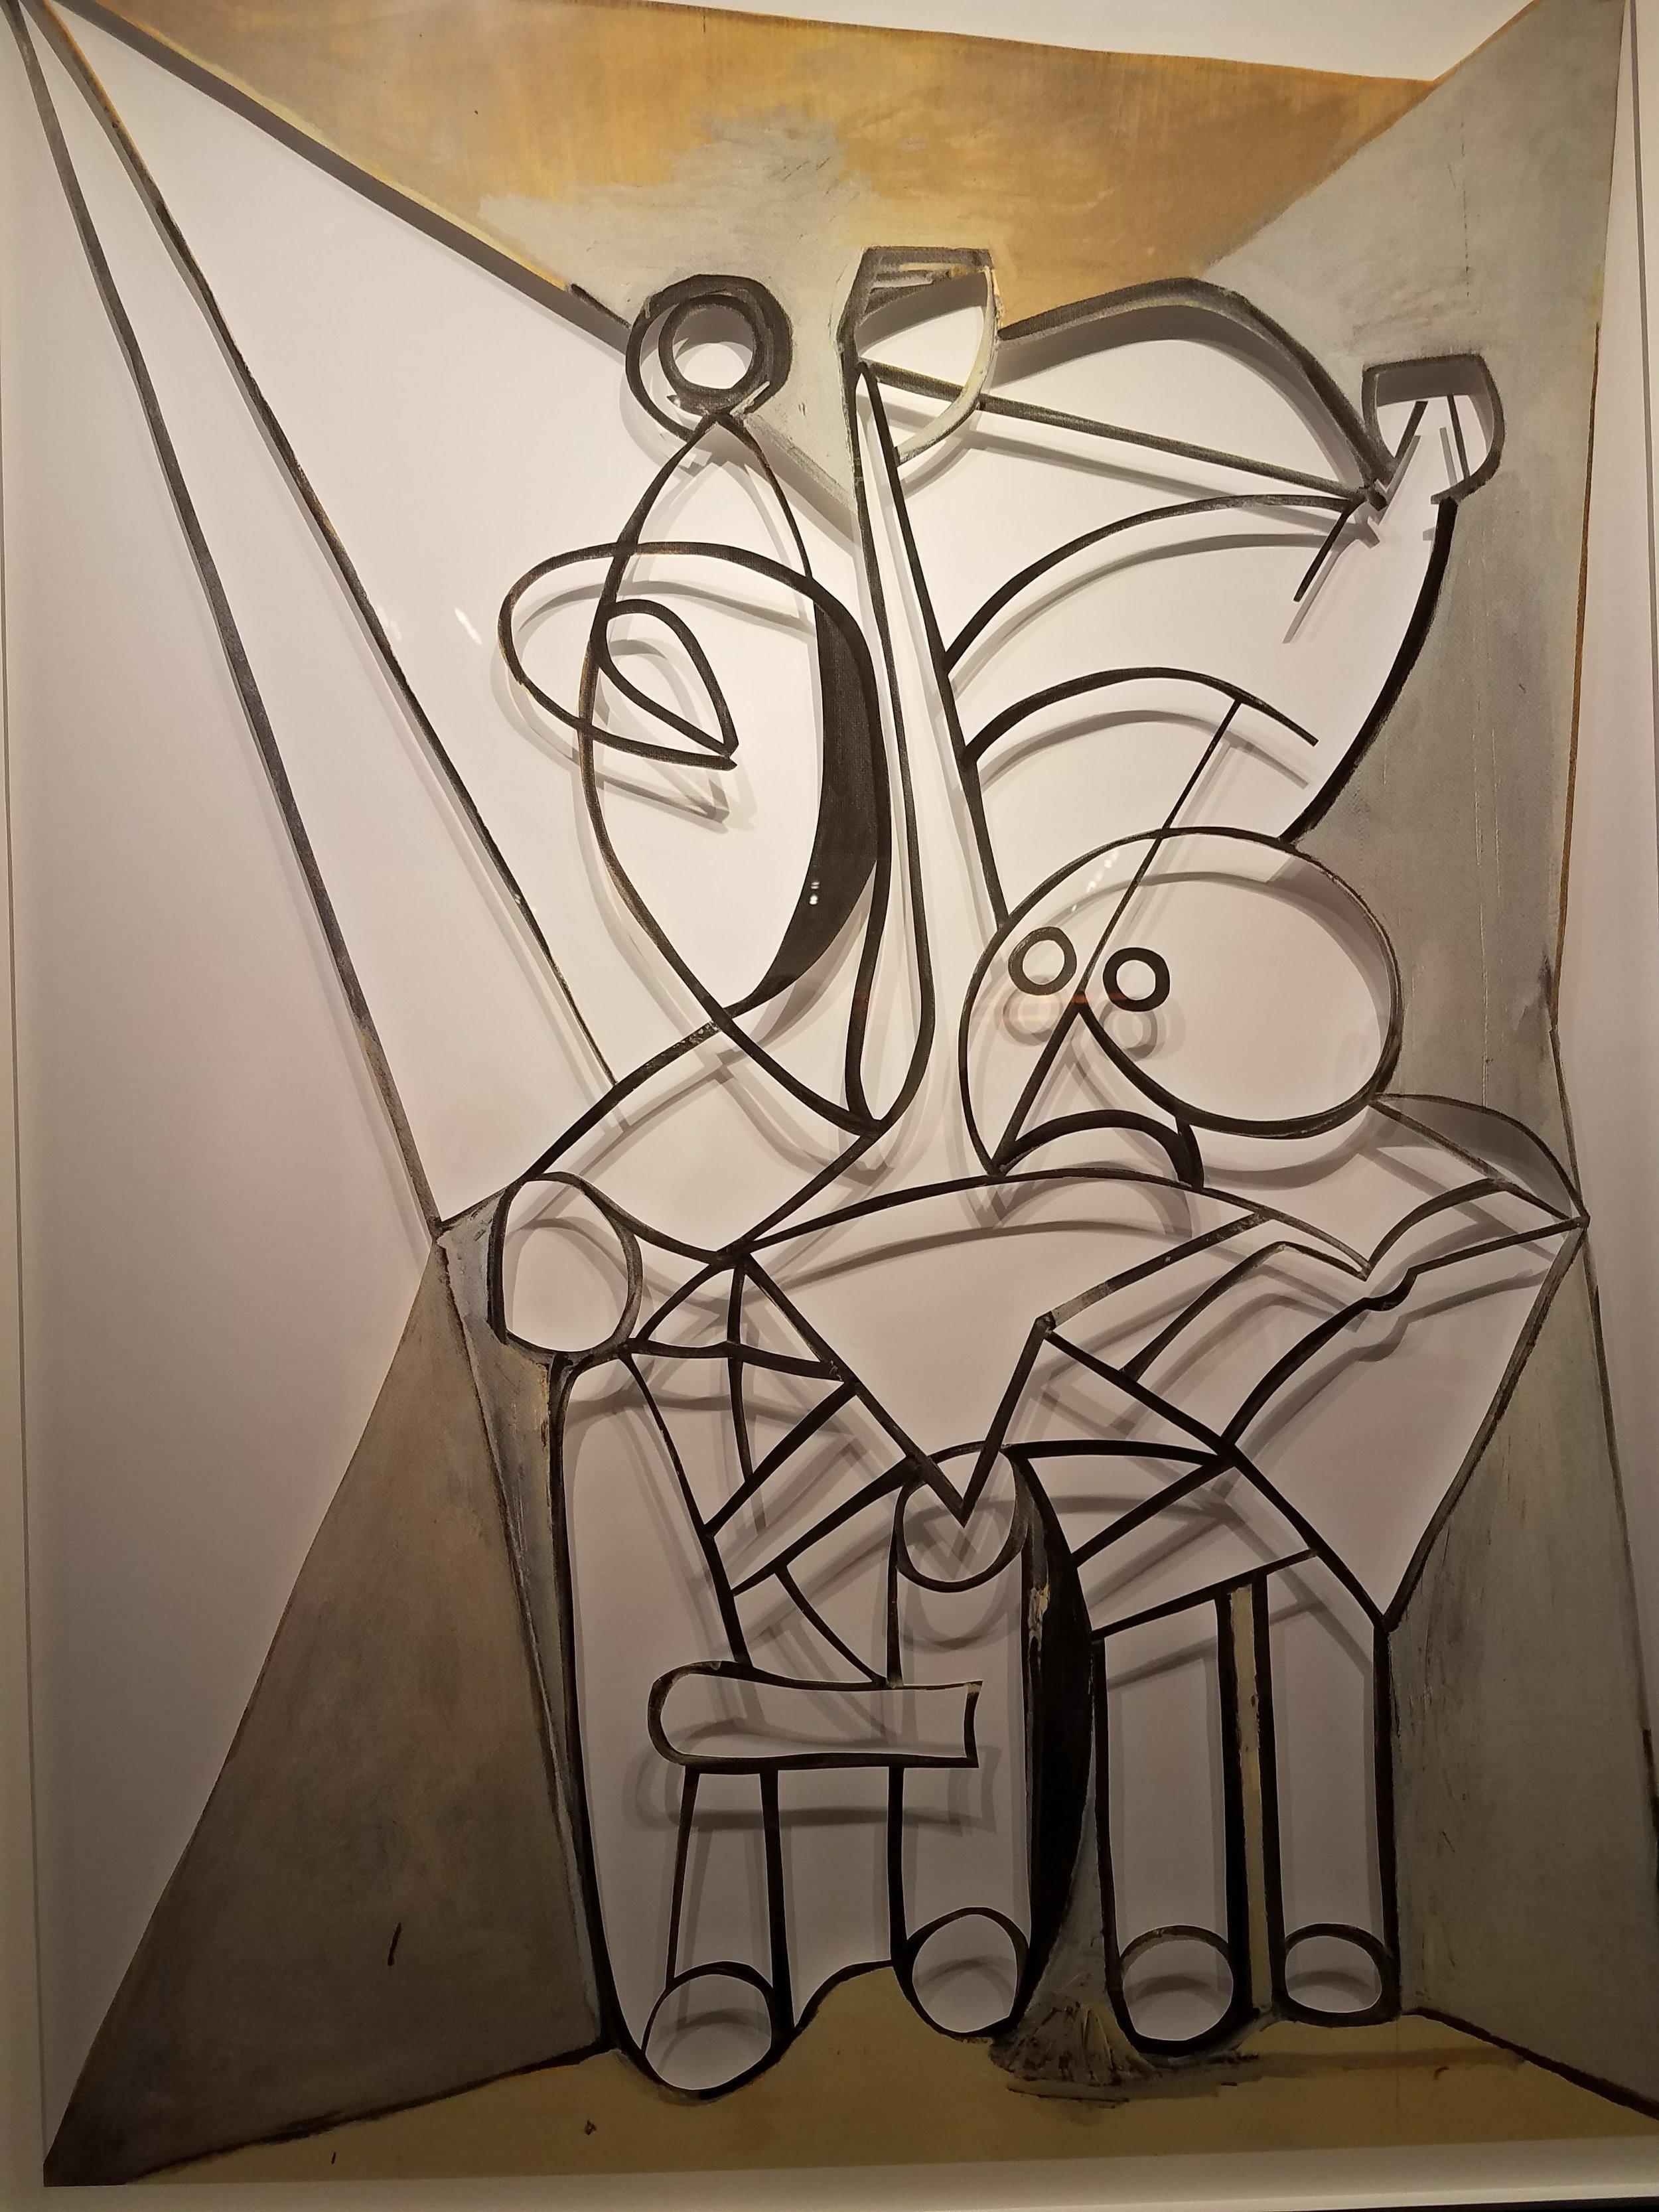 Jose Davila, Untitled (Nature Morte au crane sur une chaise) II, 2018